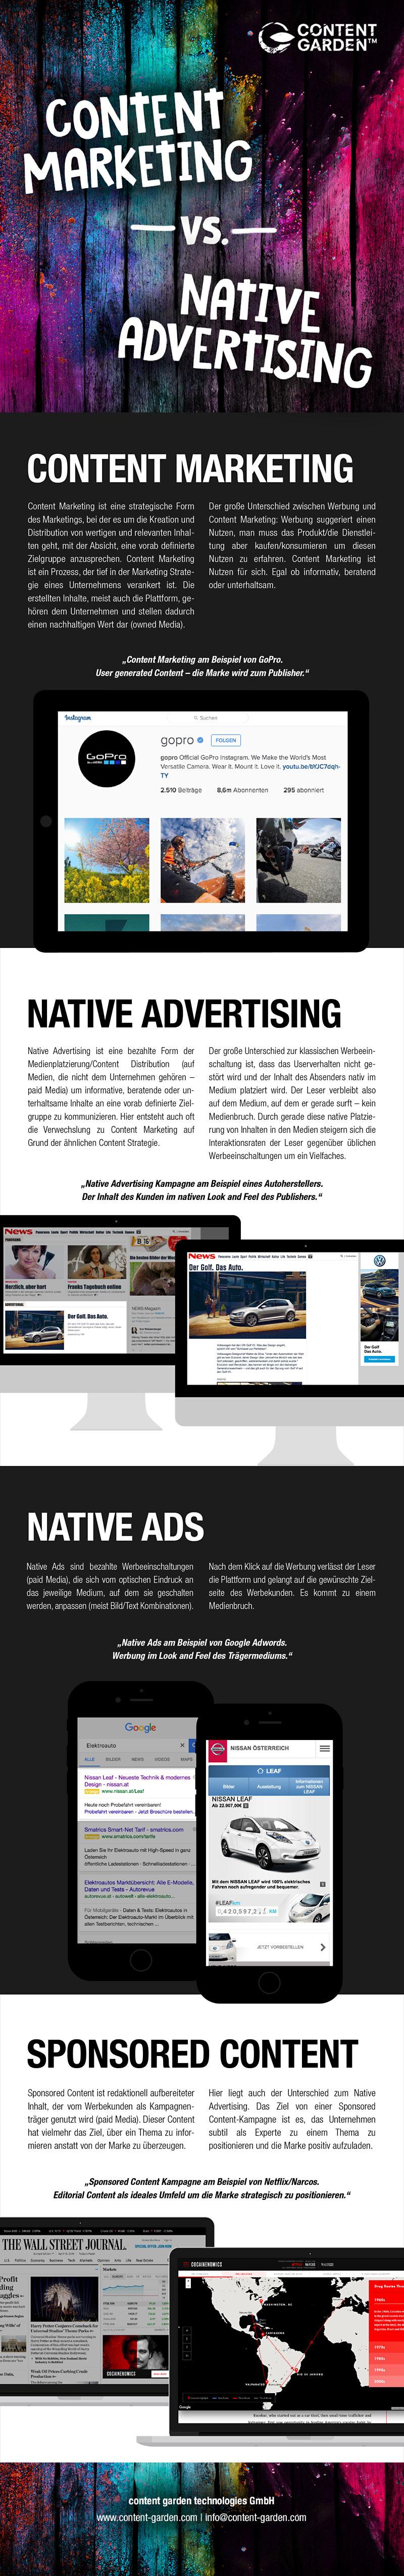 Content Garden – Content Marketing Native Advertising